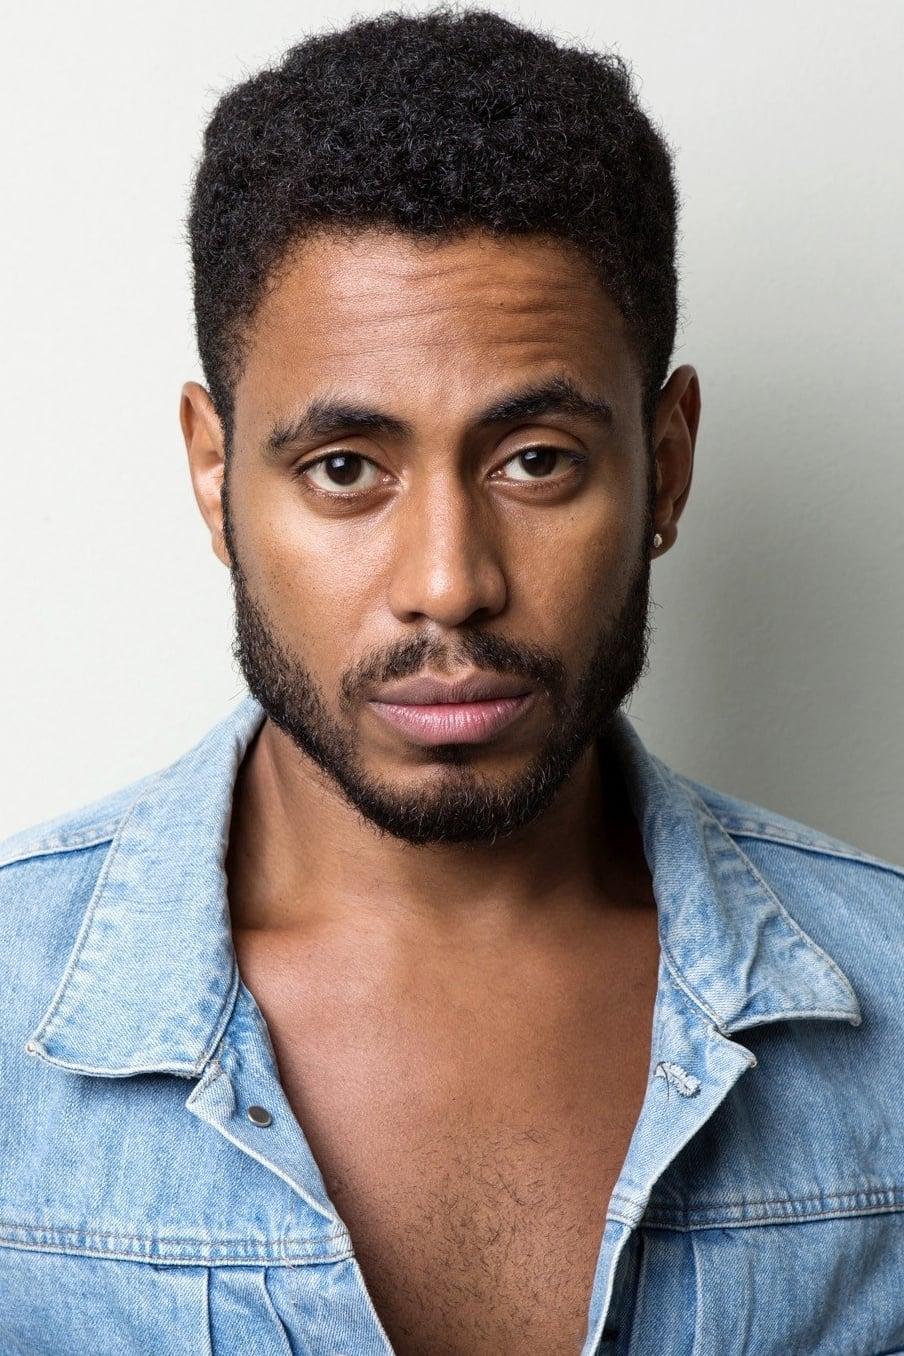 Ícaro Silva